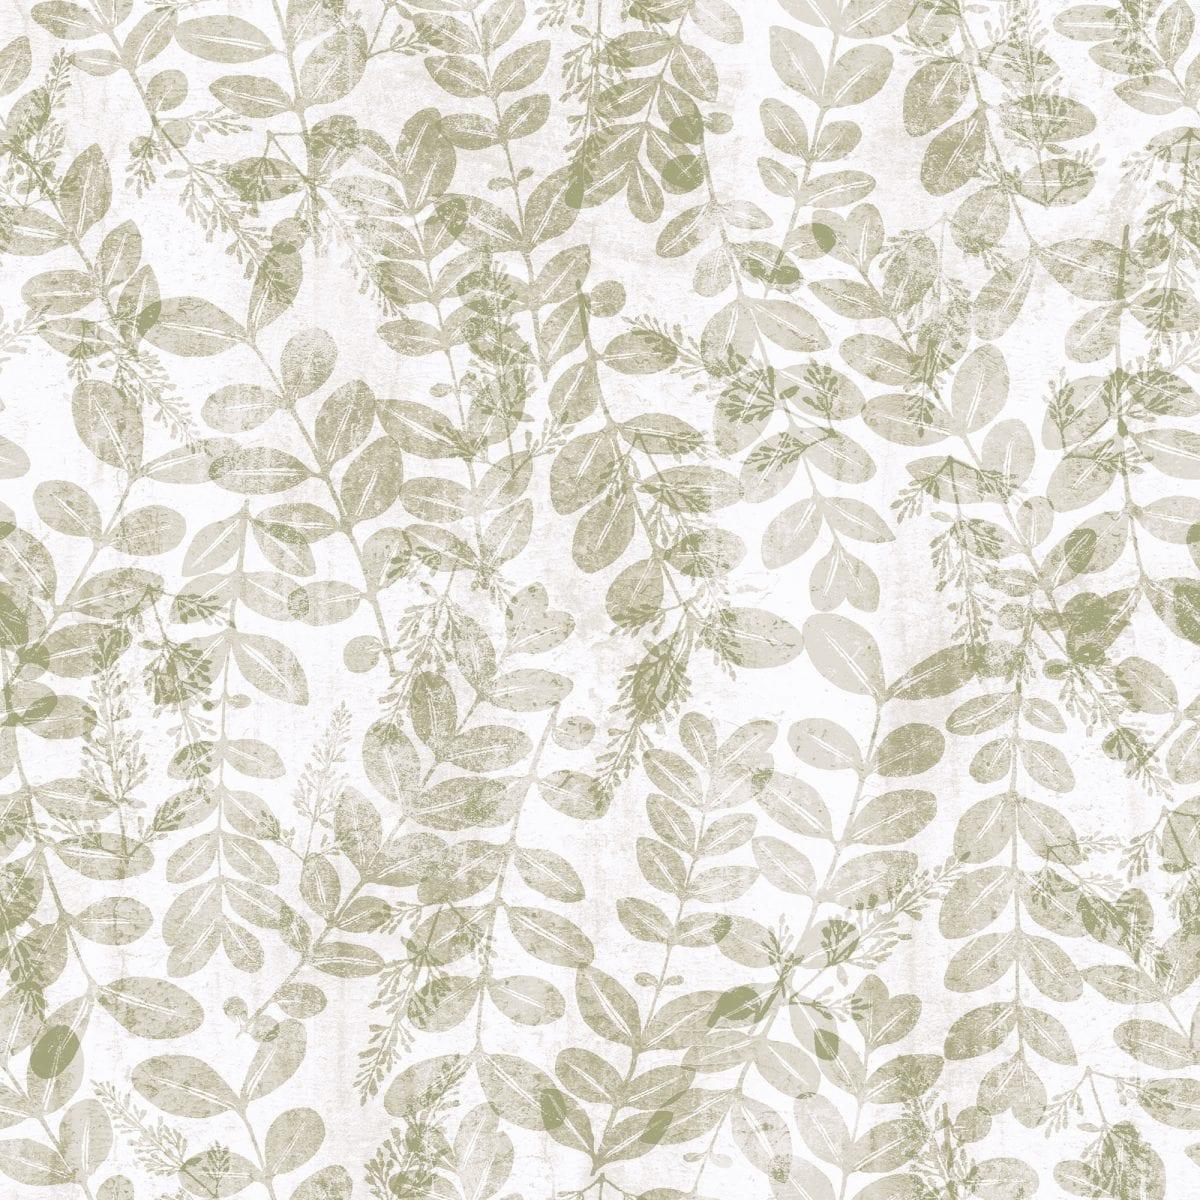 Papel mural vinilizado zen hojas beige 3711 1 cinthiasa for Colowall papel mural santiago